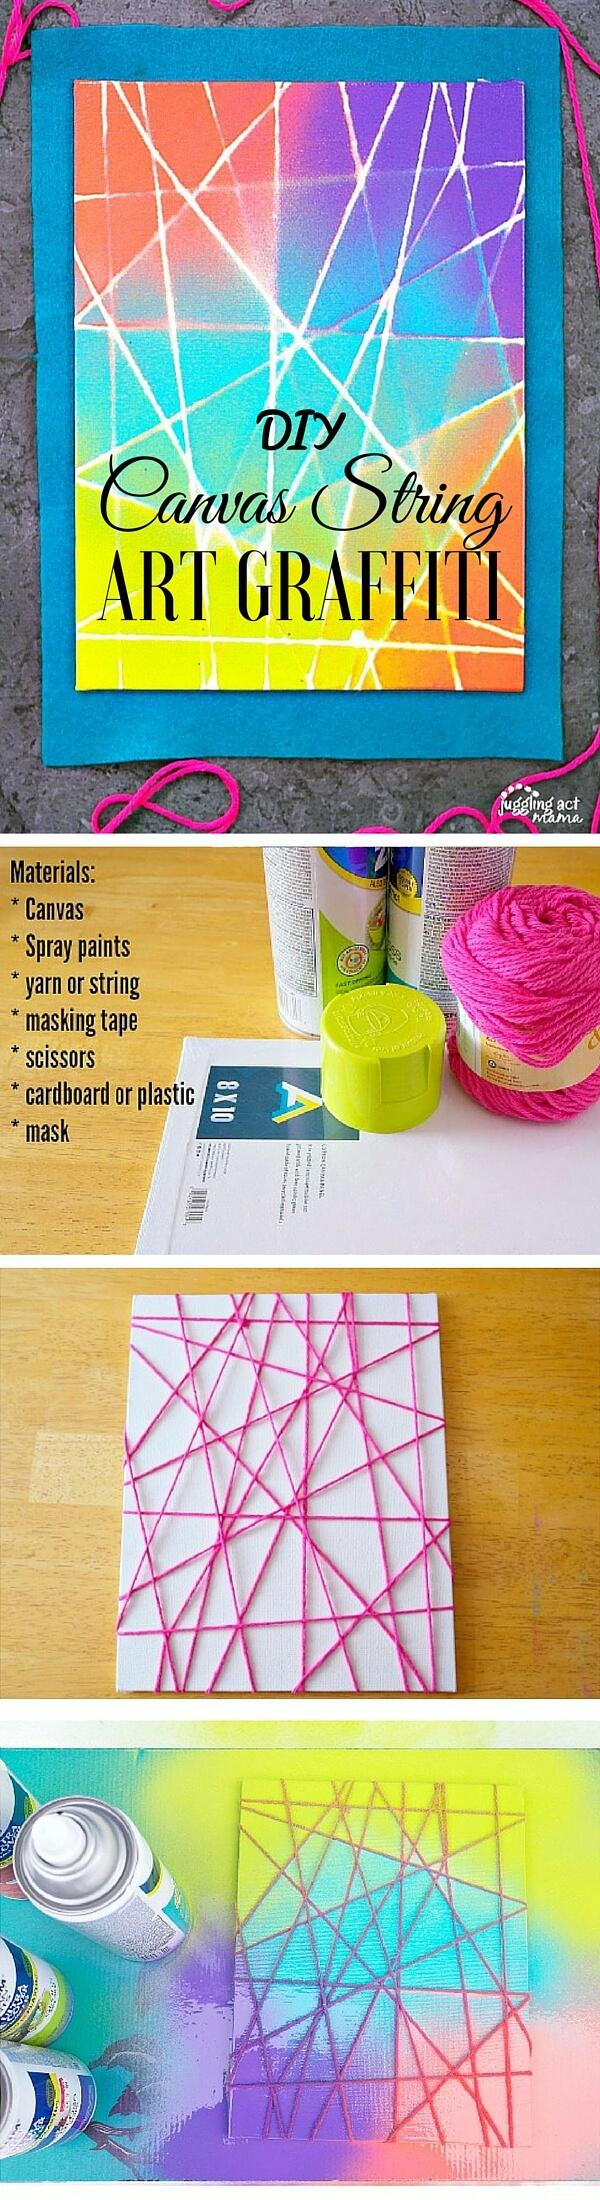 canvas-string-art-graffiti-k4craft Easy DIY Home Decor Crafts - Step by step